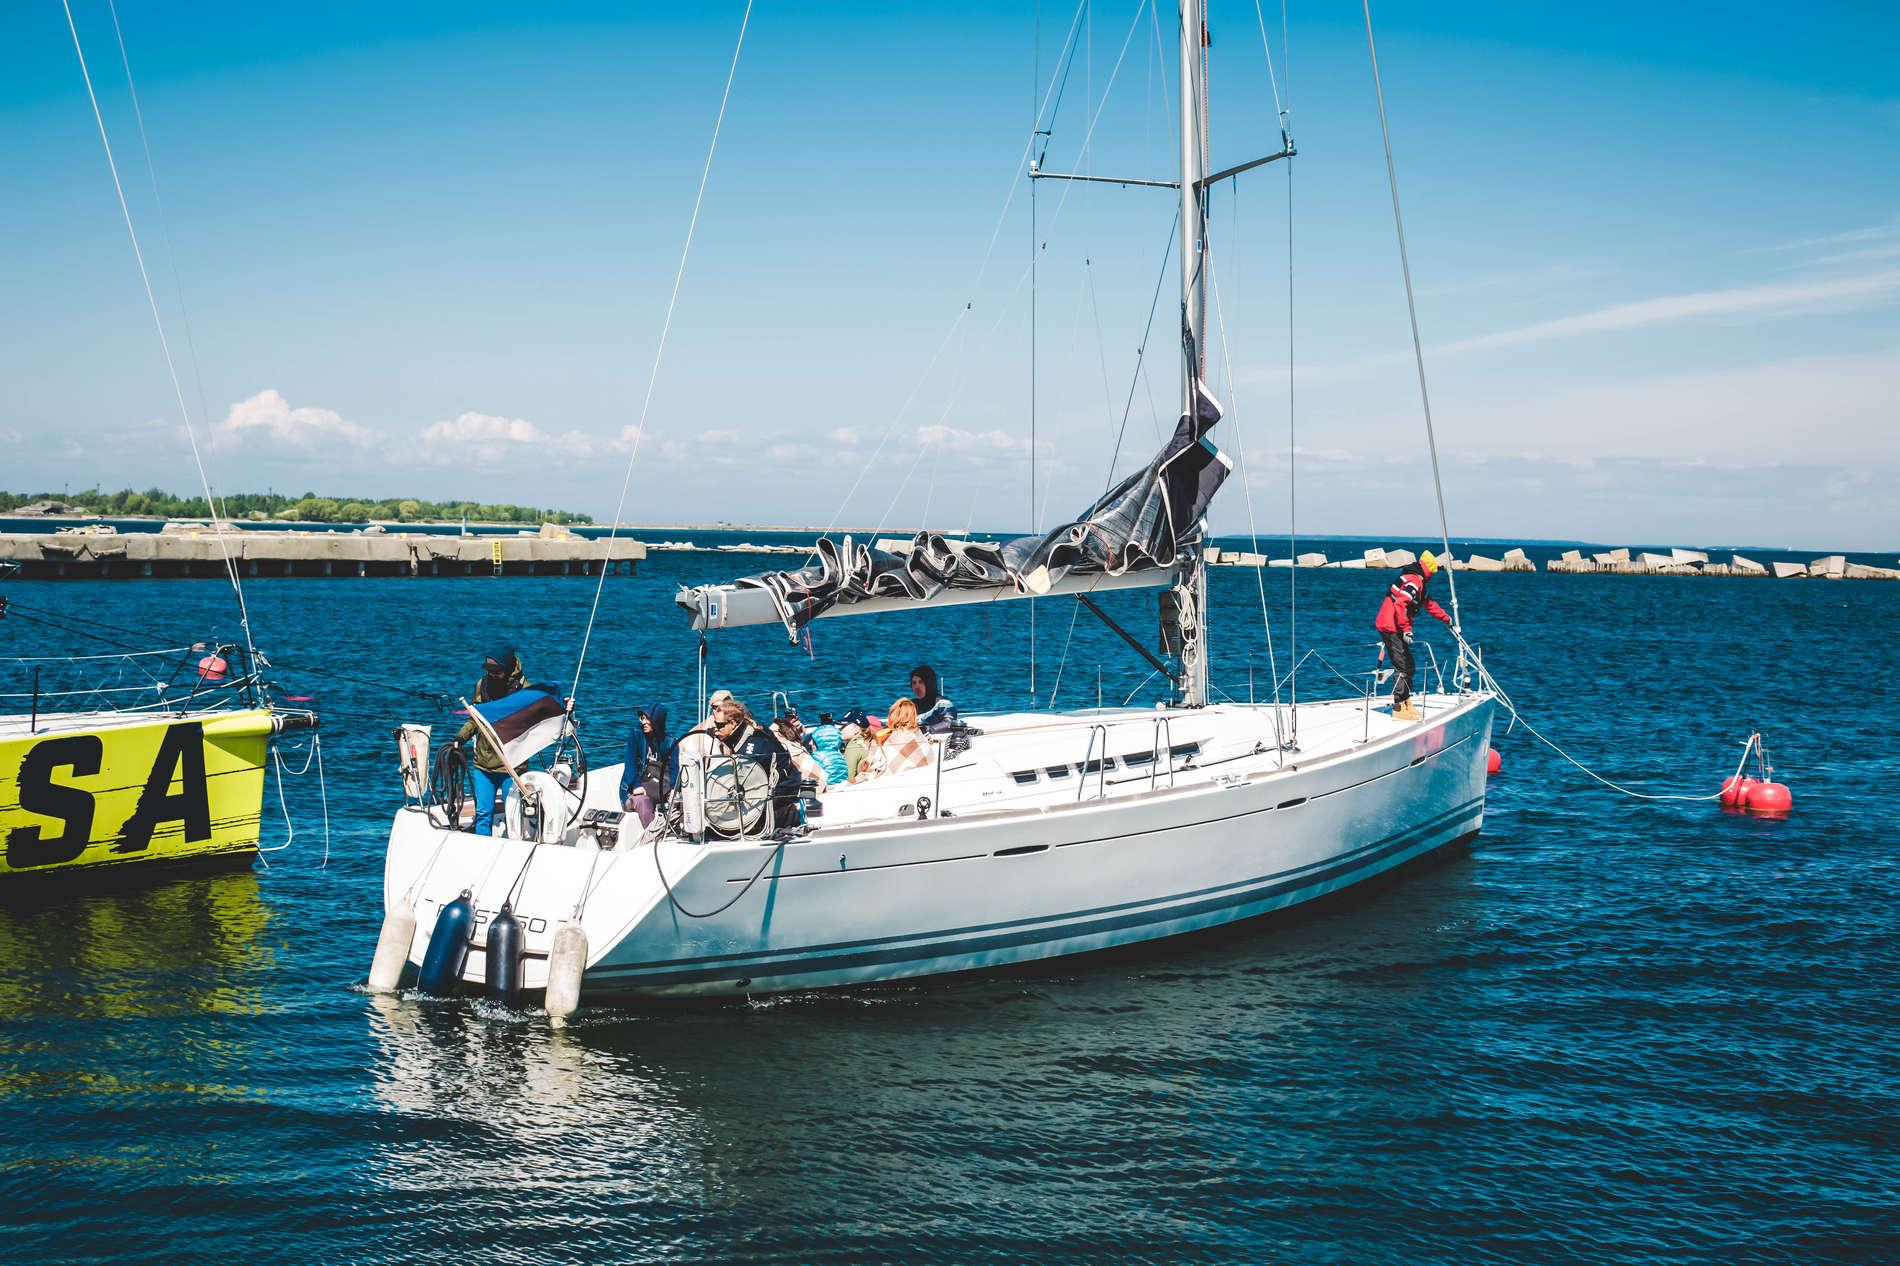 Yacht trip in Tallinn Bay